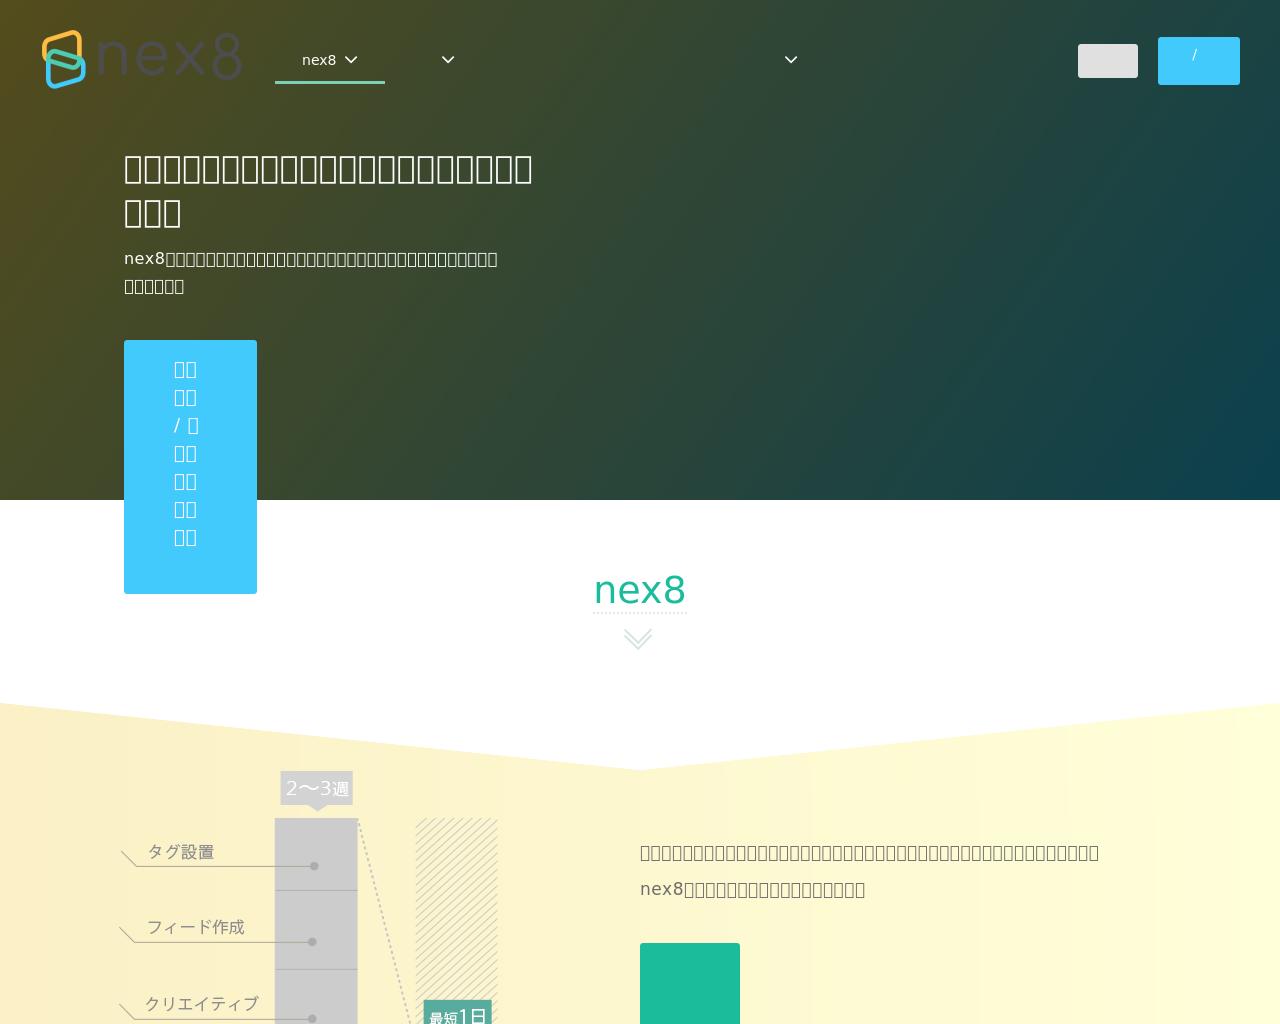 Nex8.net-Advertising-Reviews-Pricing